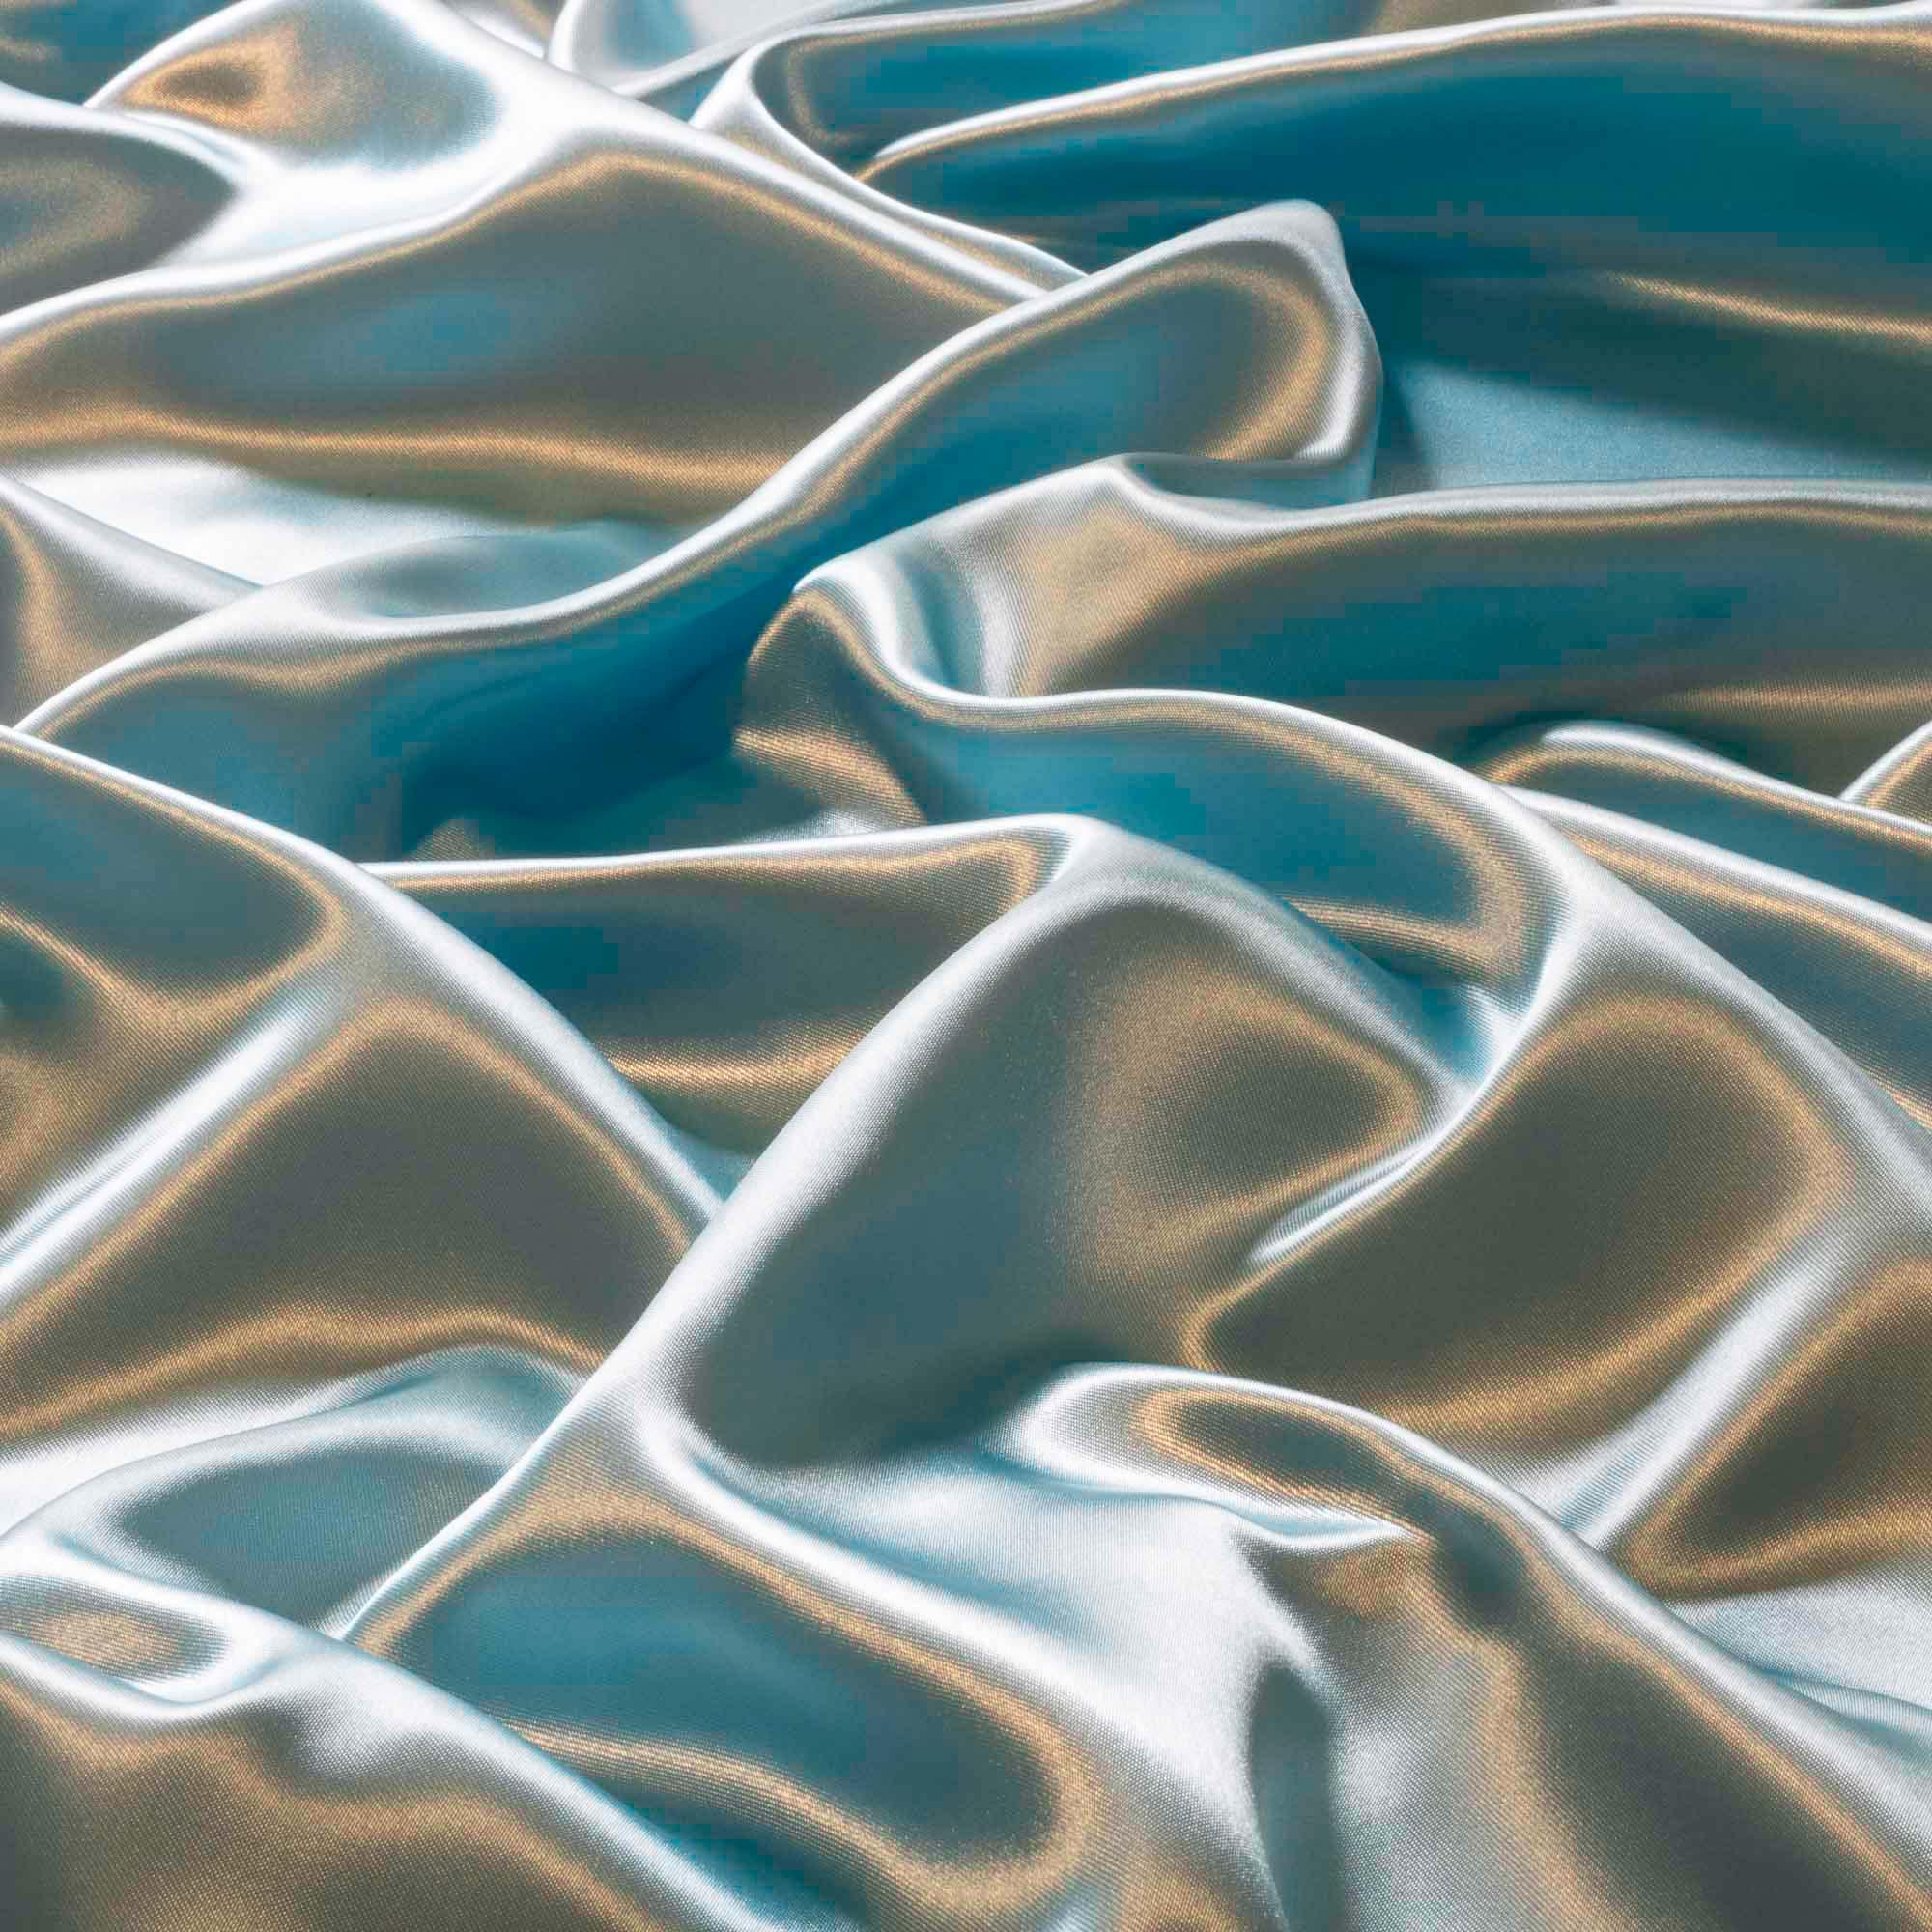 Tecido Cetim Charmeuse Azul Claro 100% Poliester 1,40 m Largura